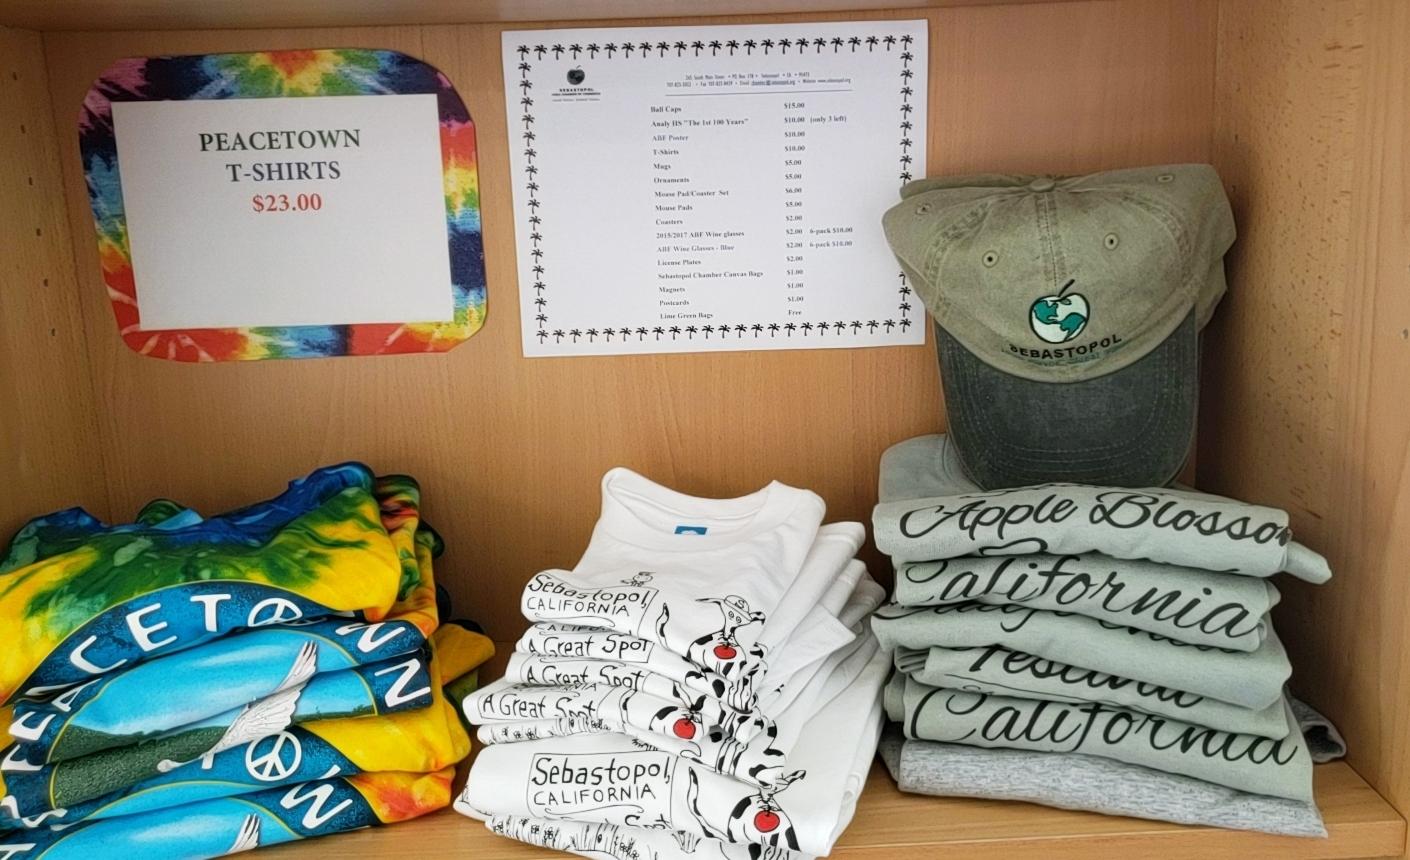 Peacetown T--Shirts---Sebastopol T-Shirts---Caps